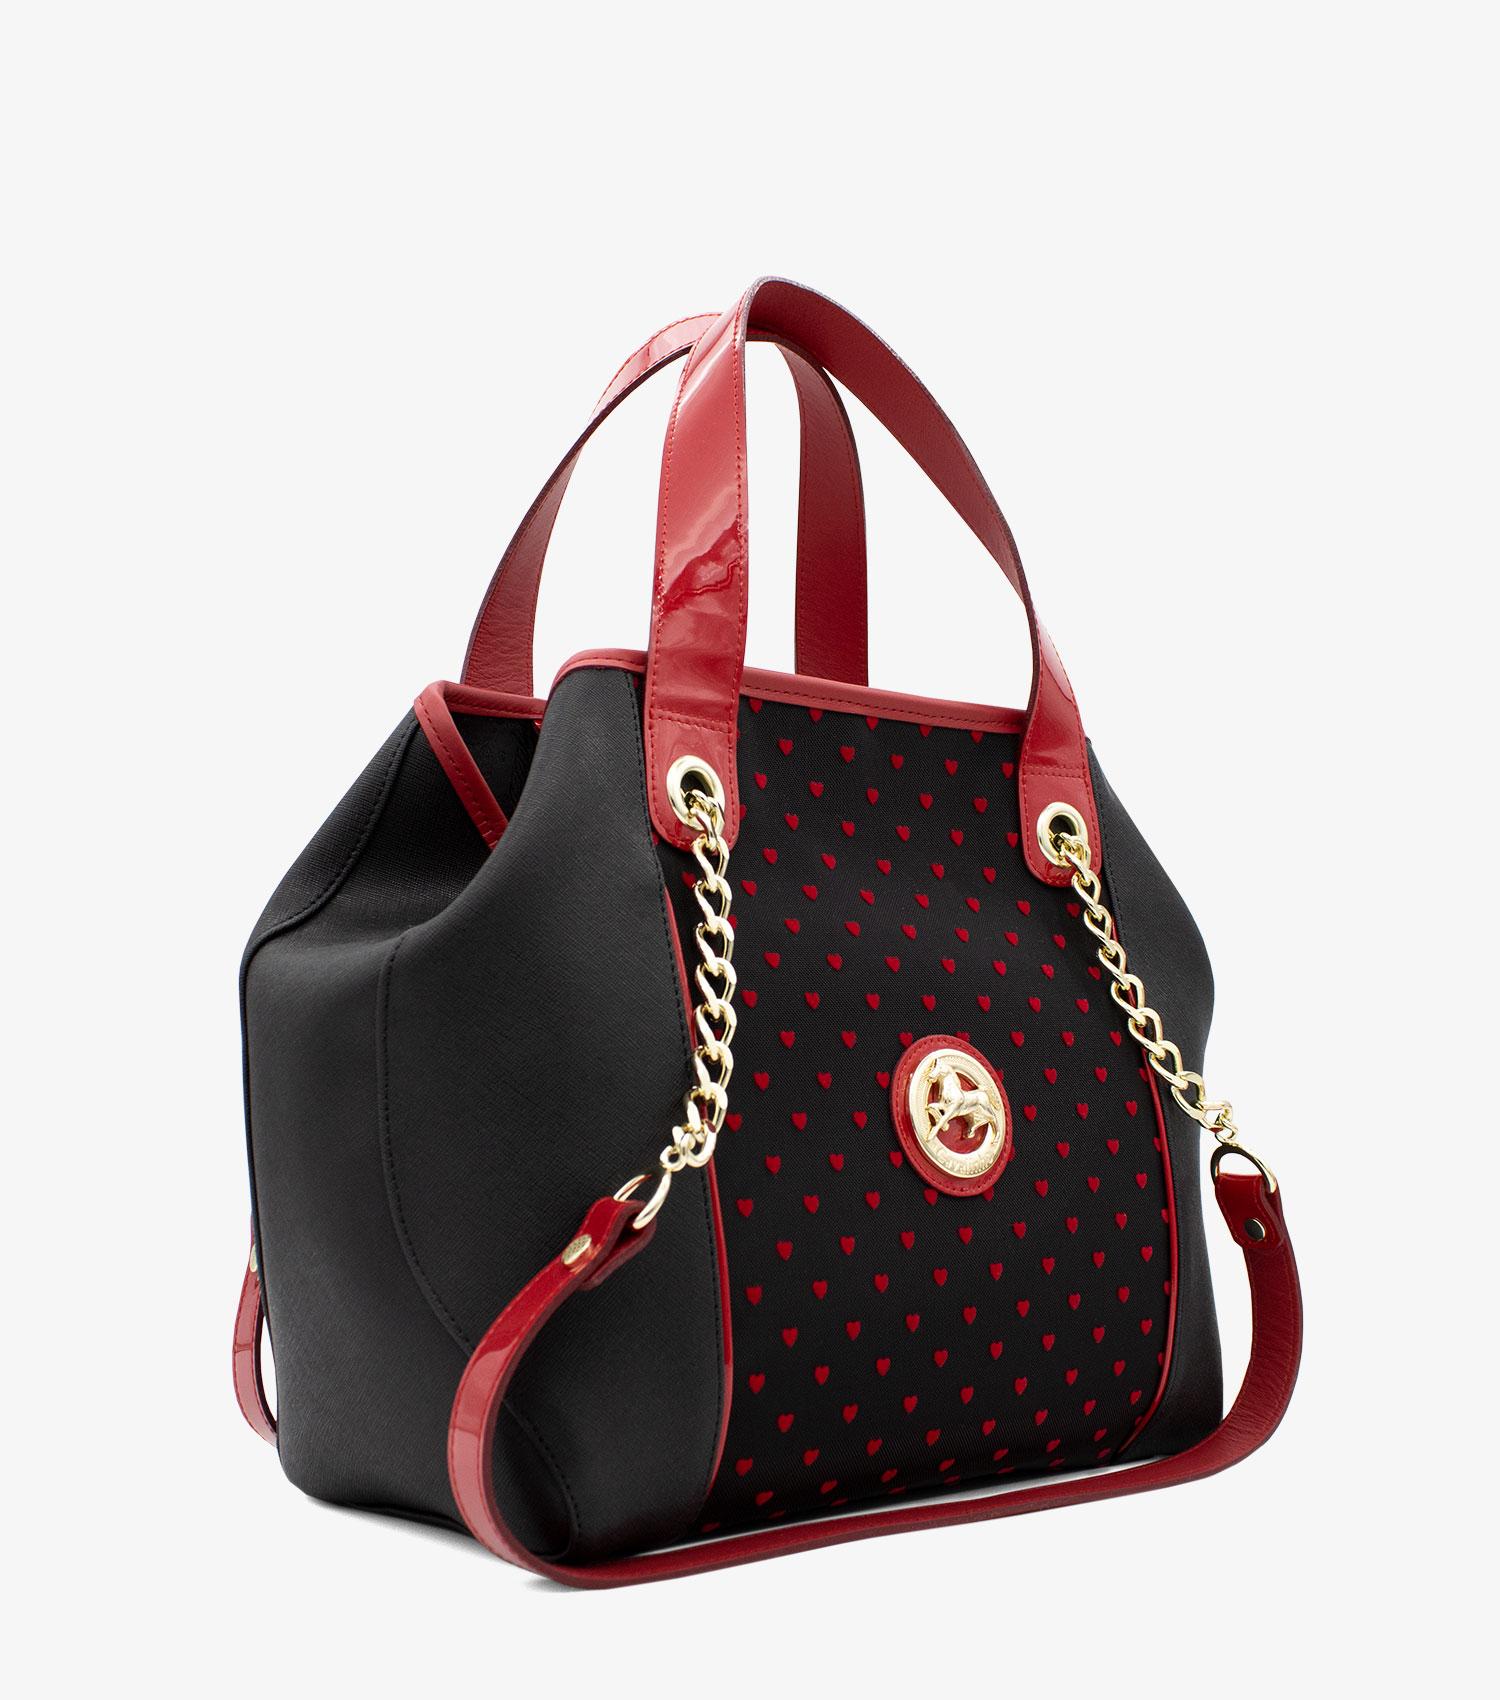 EndLess Love Handbag